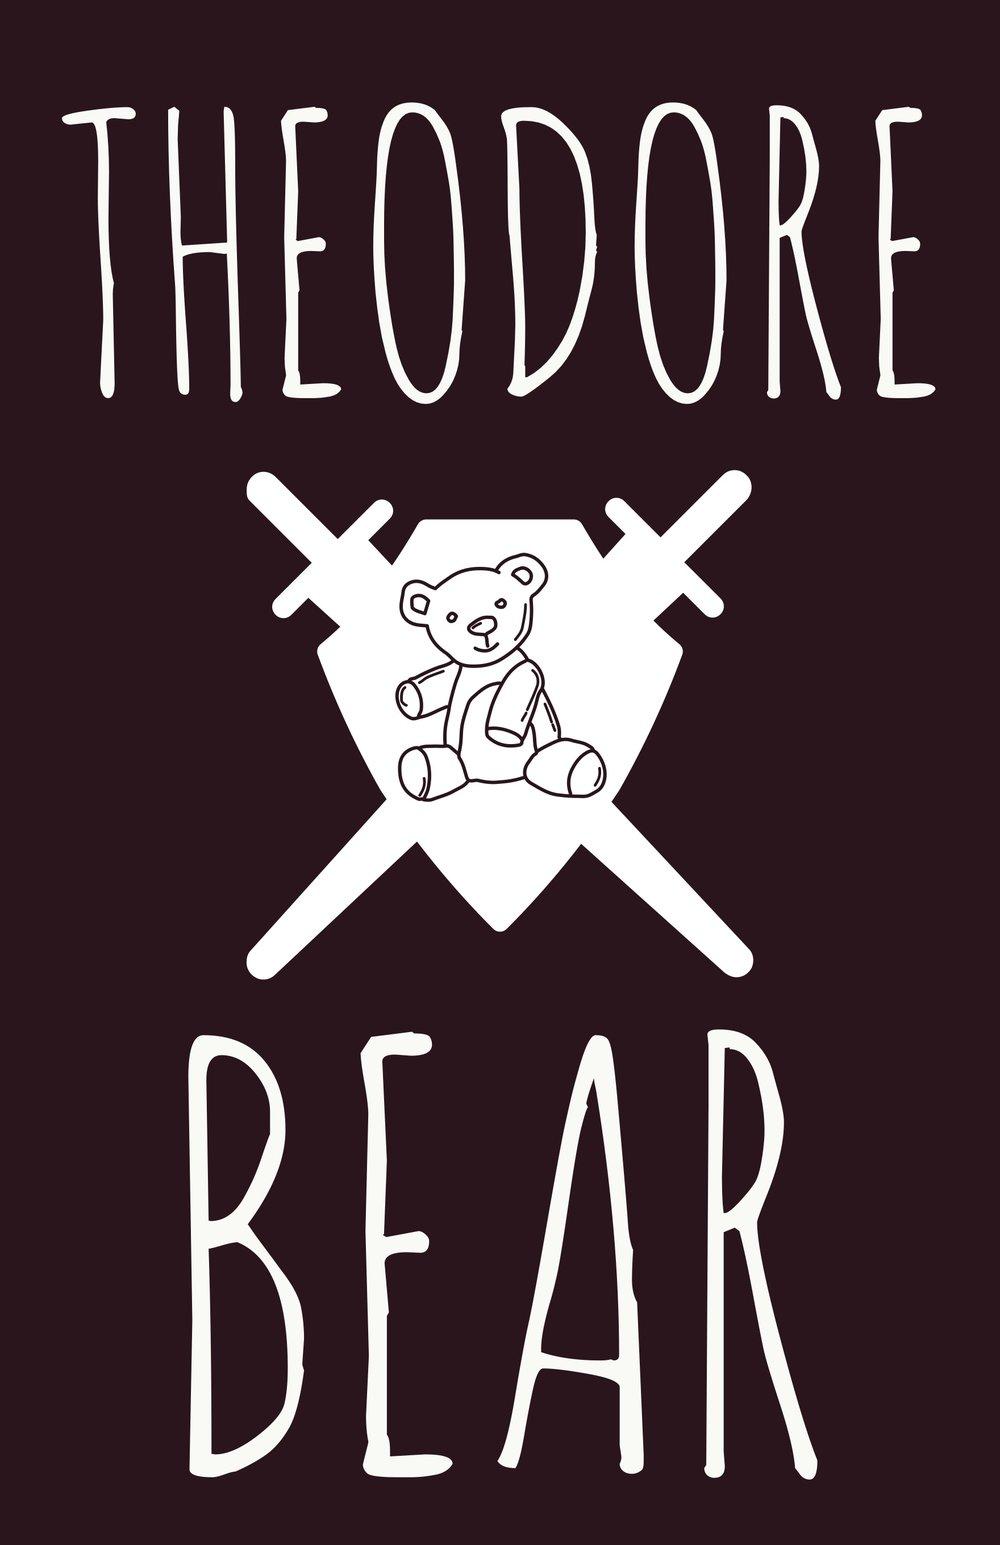 Theodore Bear.JPG